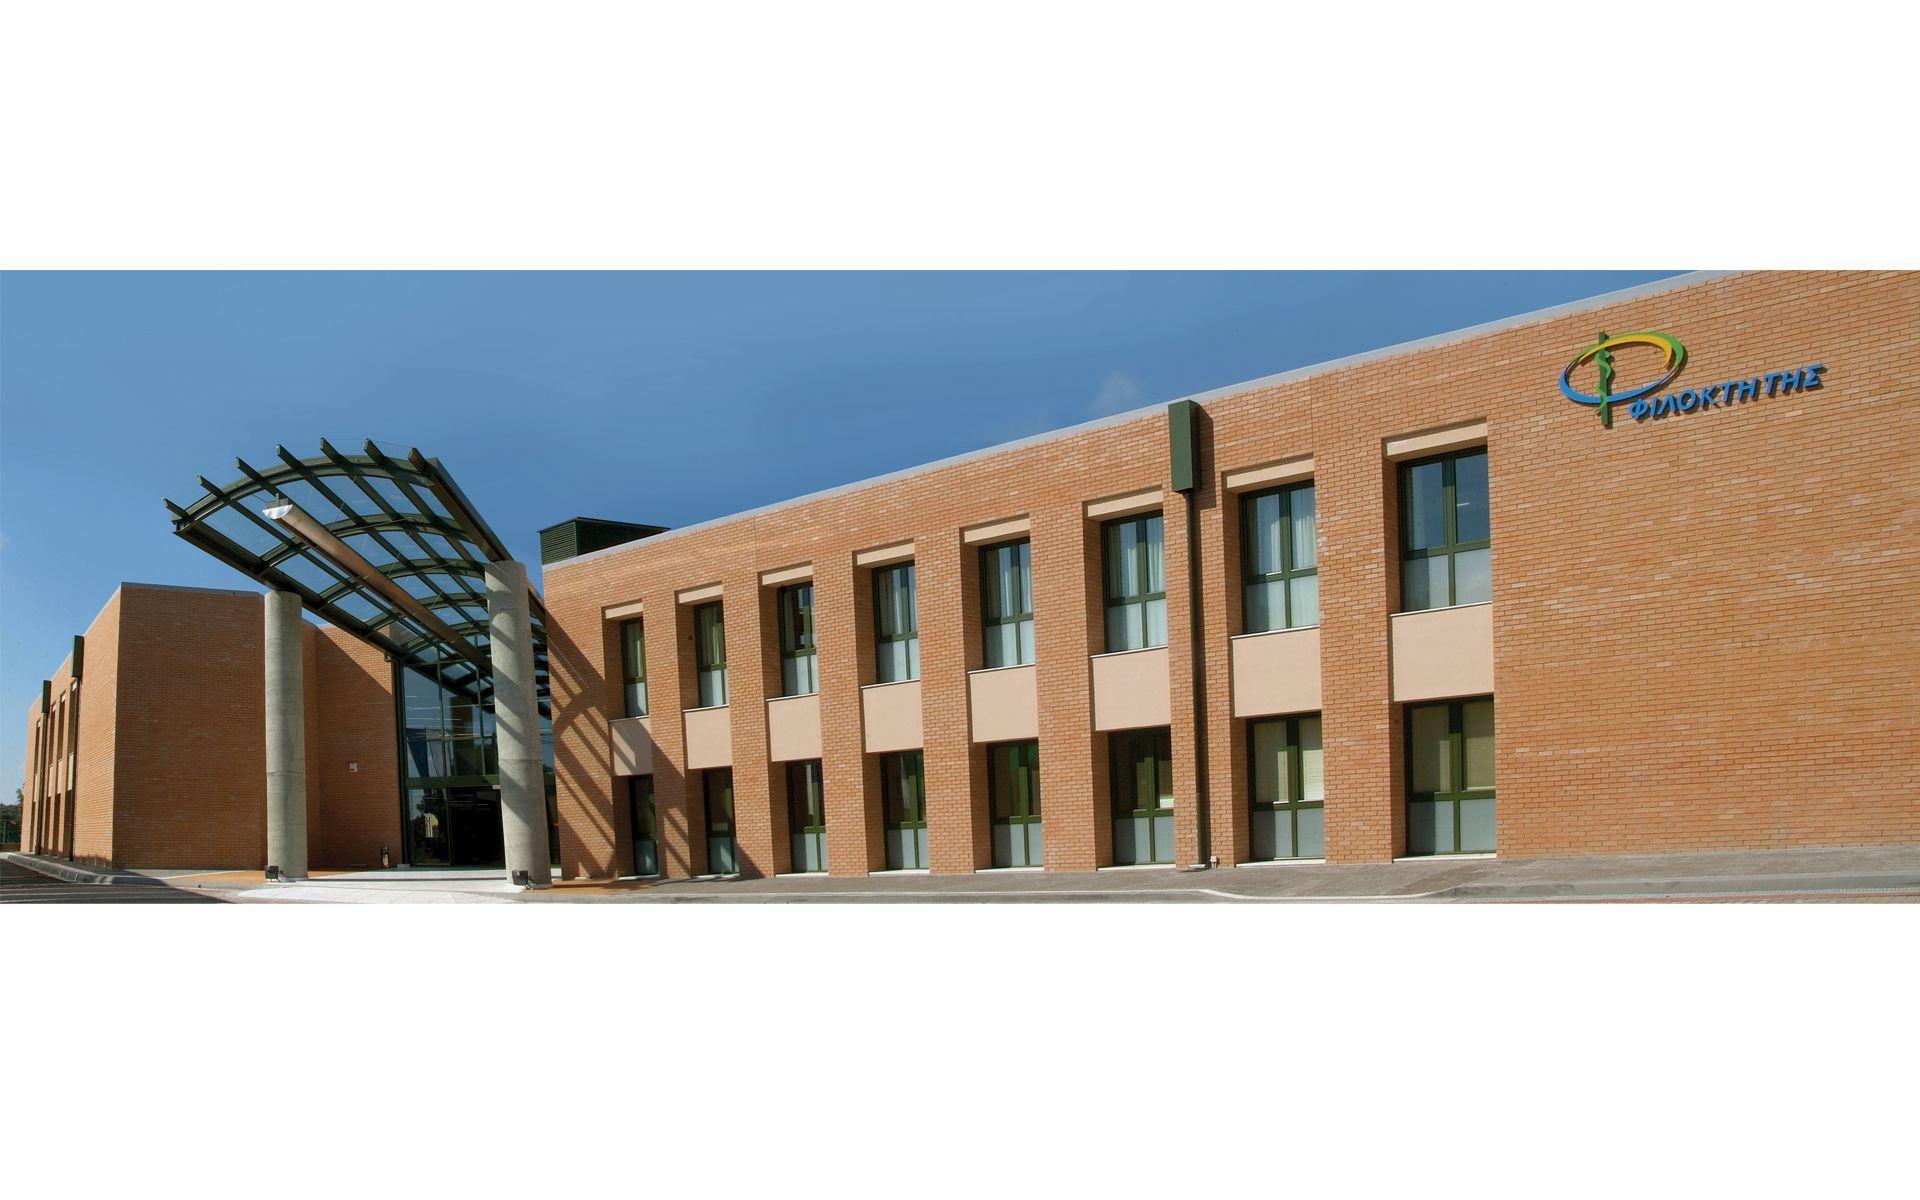 Filoktitis-building